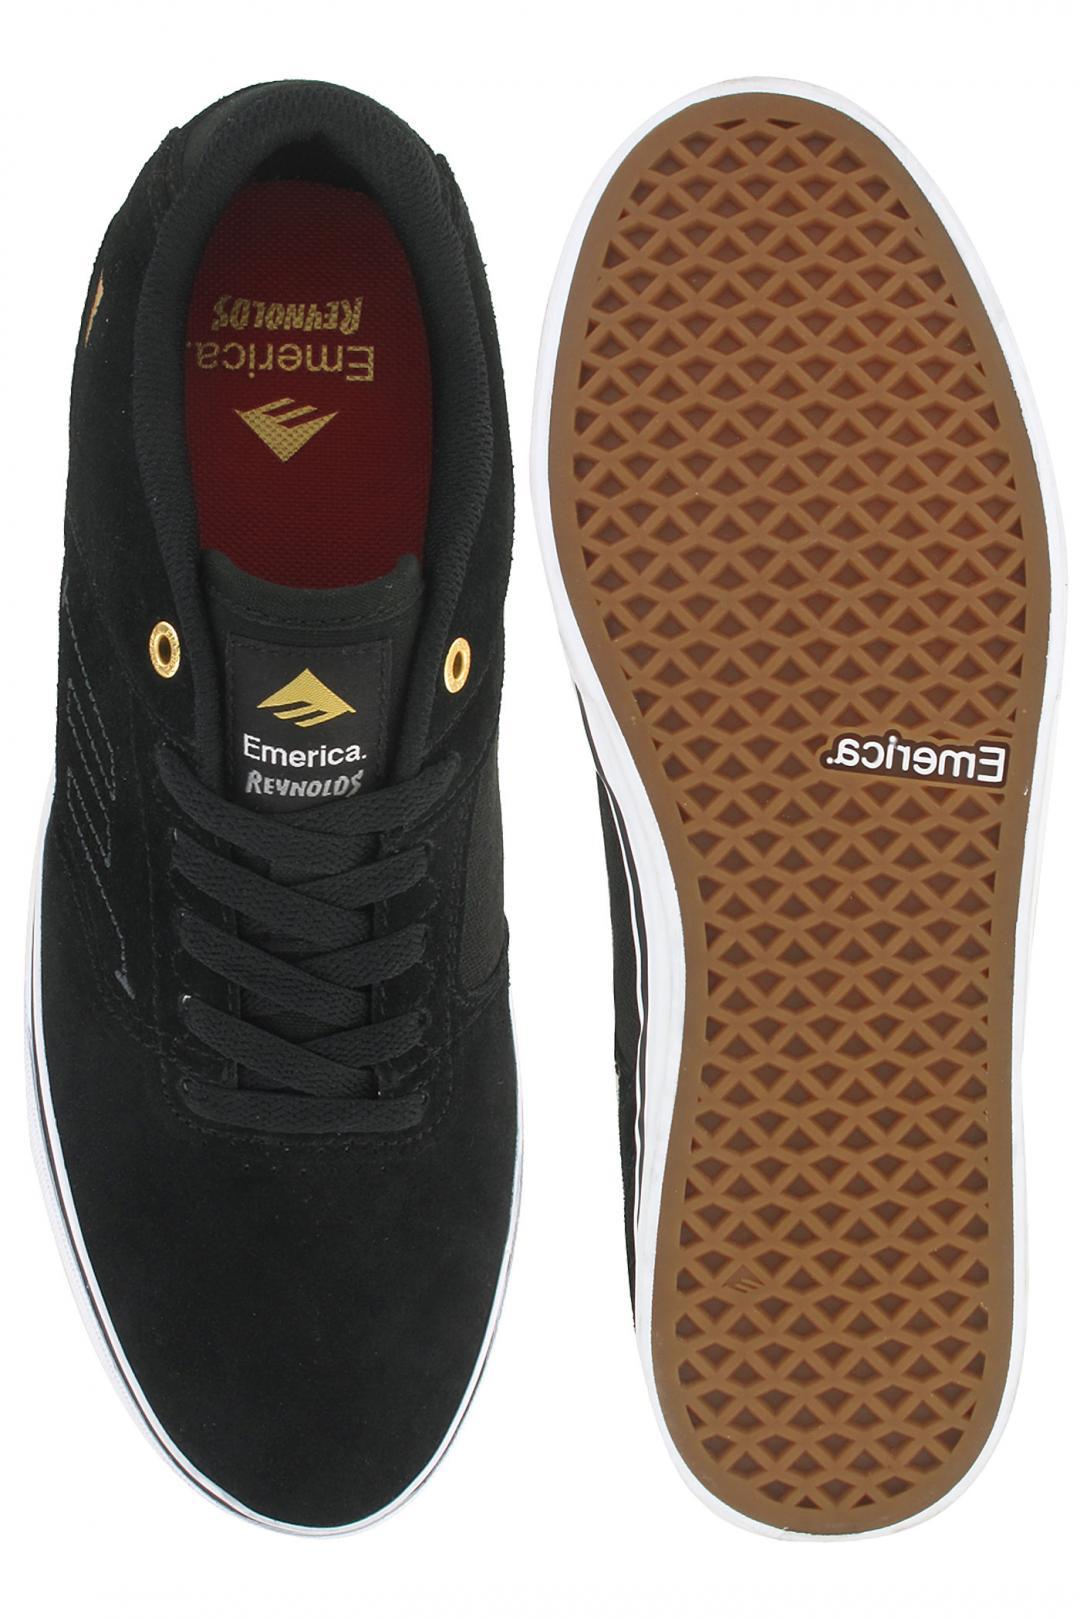 Uomo Emerica The Reynolds Low Vulc black white | Sneakers low top